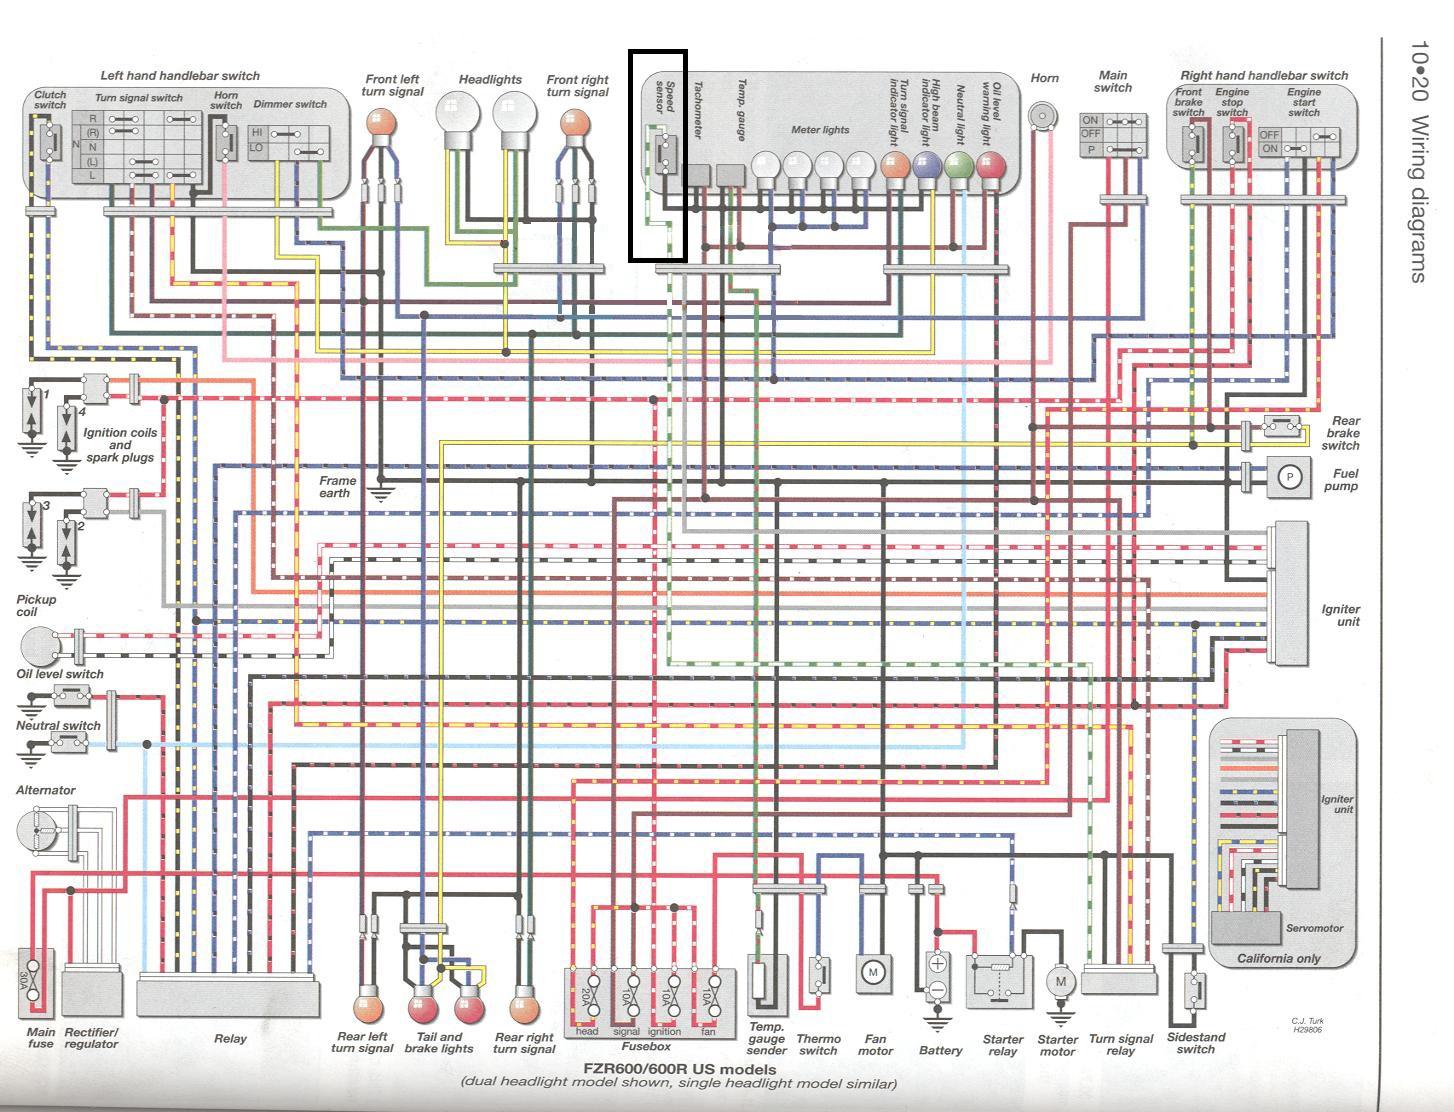 02 Gsxr 1000 Wiring Diagram - Wiring Data Diagram  Suzuki Gsxr Wiring Diagram on suzuki hayabusa wiring diagram, suzuki vl 1500 wiring diagram, suzuki rm 250 wiring diagram, suzuki marauder wiring diagram, suzuki bandit 1200 wiring diagram, suzuki gs400 wiring diagram, suzuki ts 125 wiring diagram, suzuki gs 750 wiring diagram, suzuki rv 125 wiring diagram, suzuki gs 450 wiring diagram, triumph speed triple wiring diagram, kawasaki wiring diagram, suzuki gsx 750 wiring diagram, suzuki ts 100 wiring diagram, suzuki gsx-r 600 wiring diagram, ducati wiring diagram, suzuki gsxr 1100 wiring diagram, suzuki drz 400 wiring diagram, suzuki intruder wiring diagram, suzuki sv650 wiring diagram,